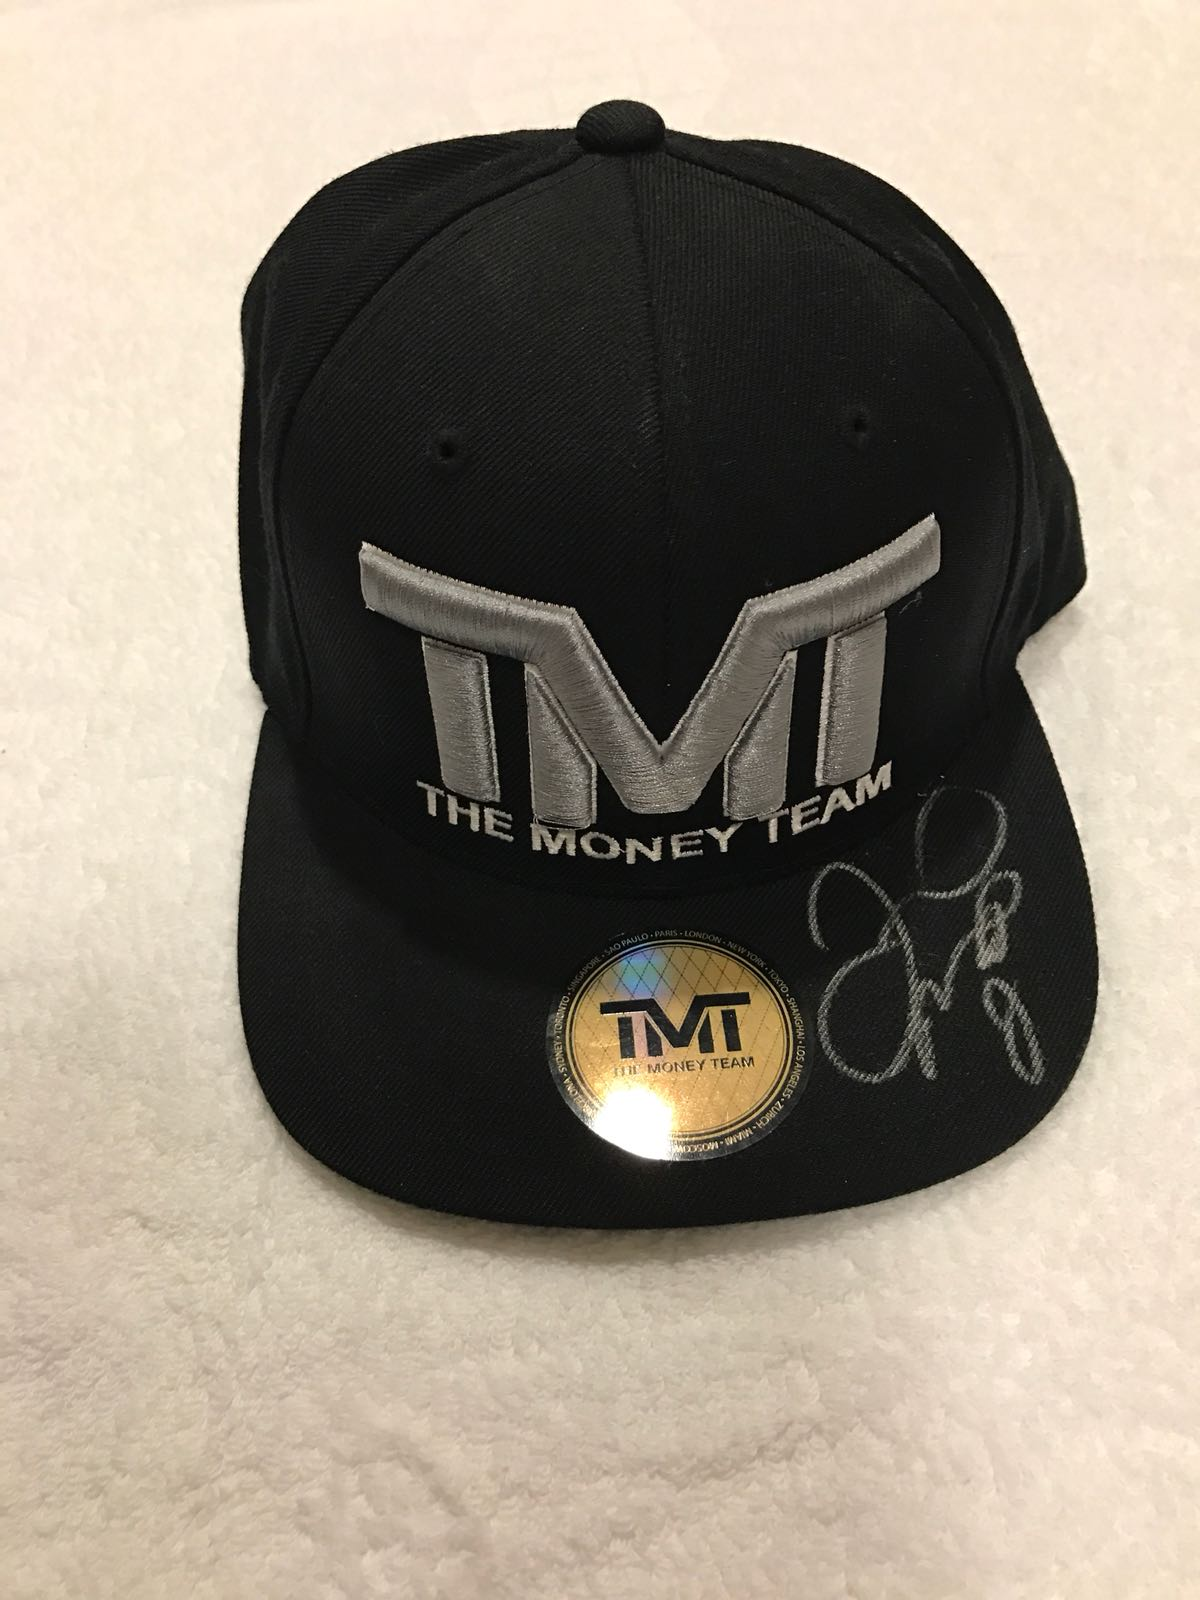 Home Floyd Mayweather Caps Floyd Mayweather Signed Black Silver Official TMT  Cap Hat.    81984fb3bdf6